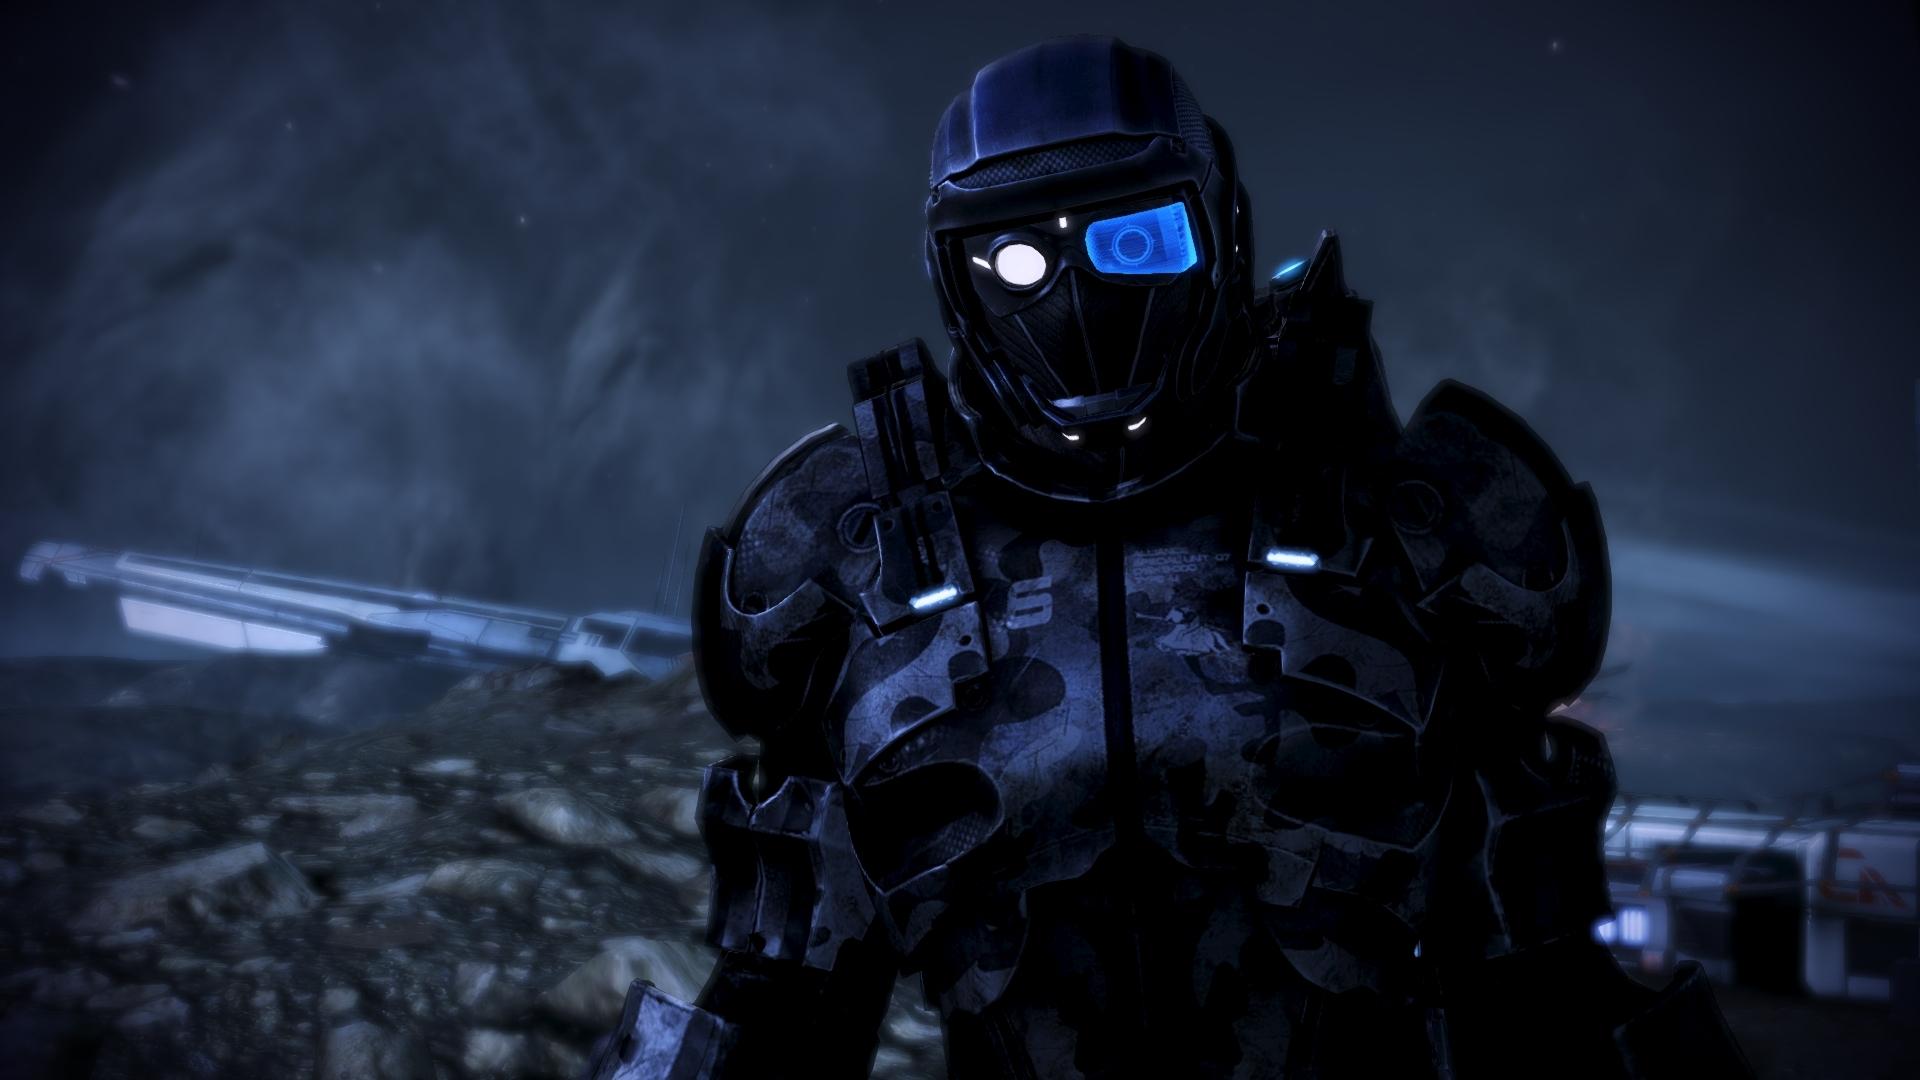 ME3 - Showcase - N7 Defender Re-Texture 005 by CorePhantom